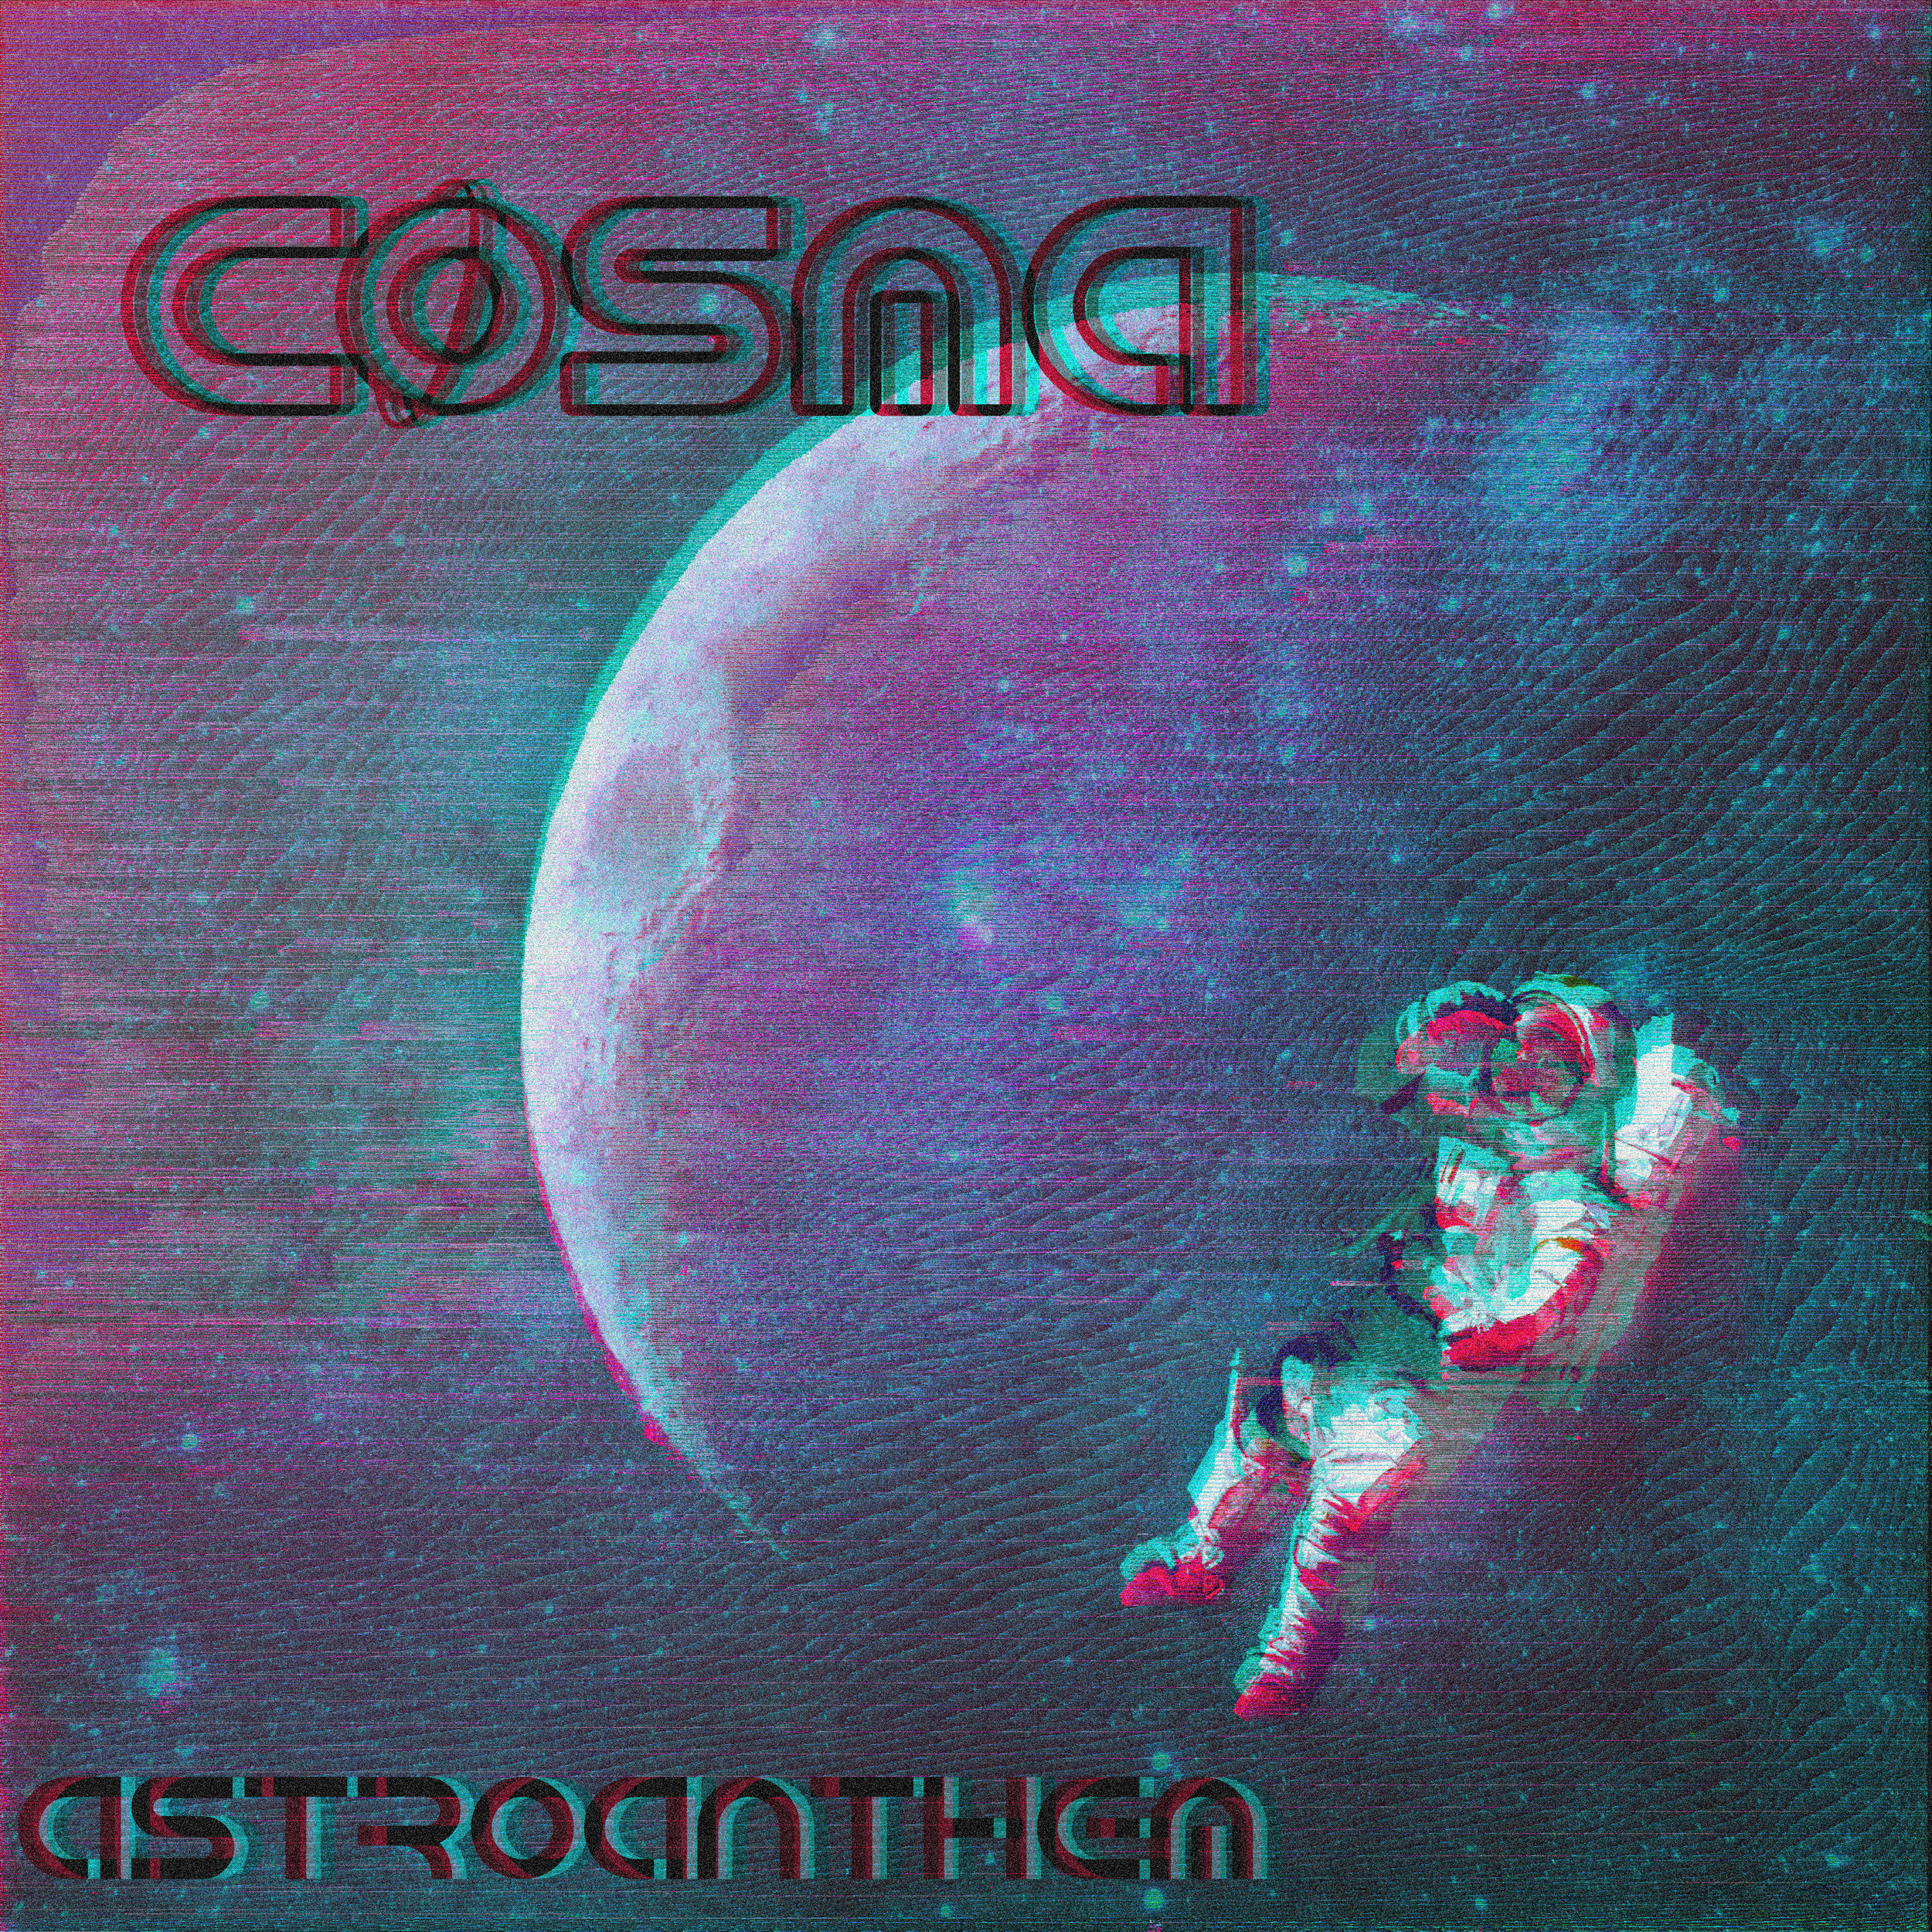 astroanthem_final copy.jpg